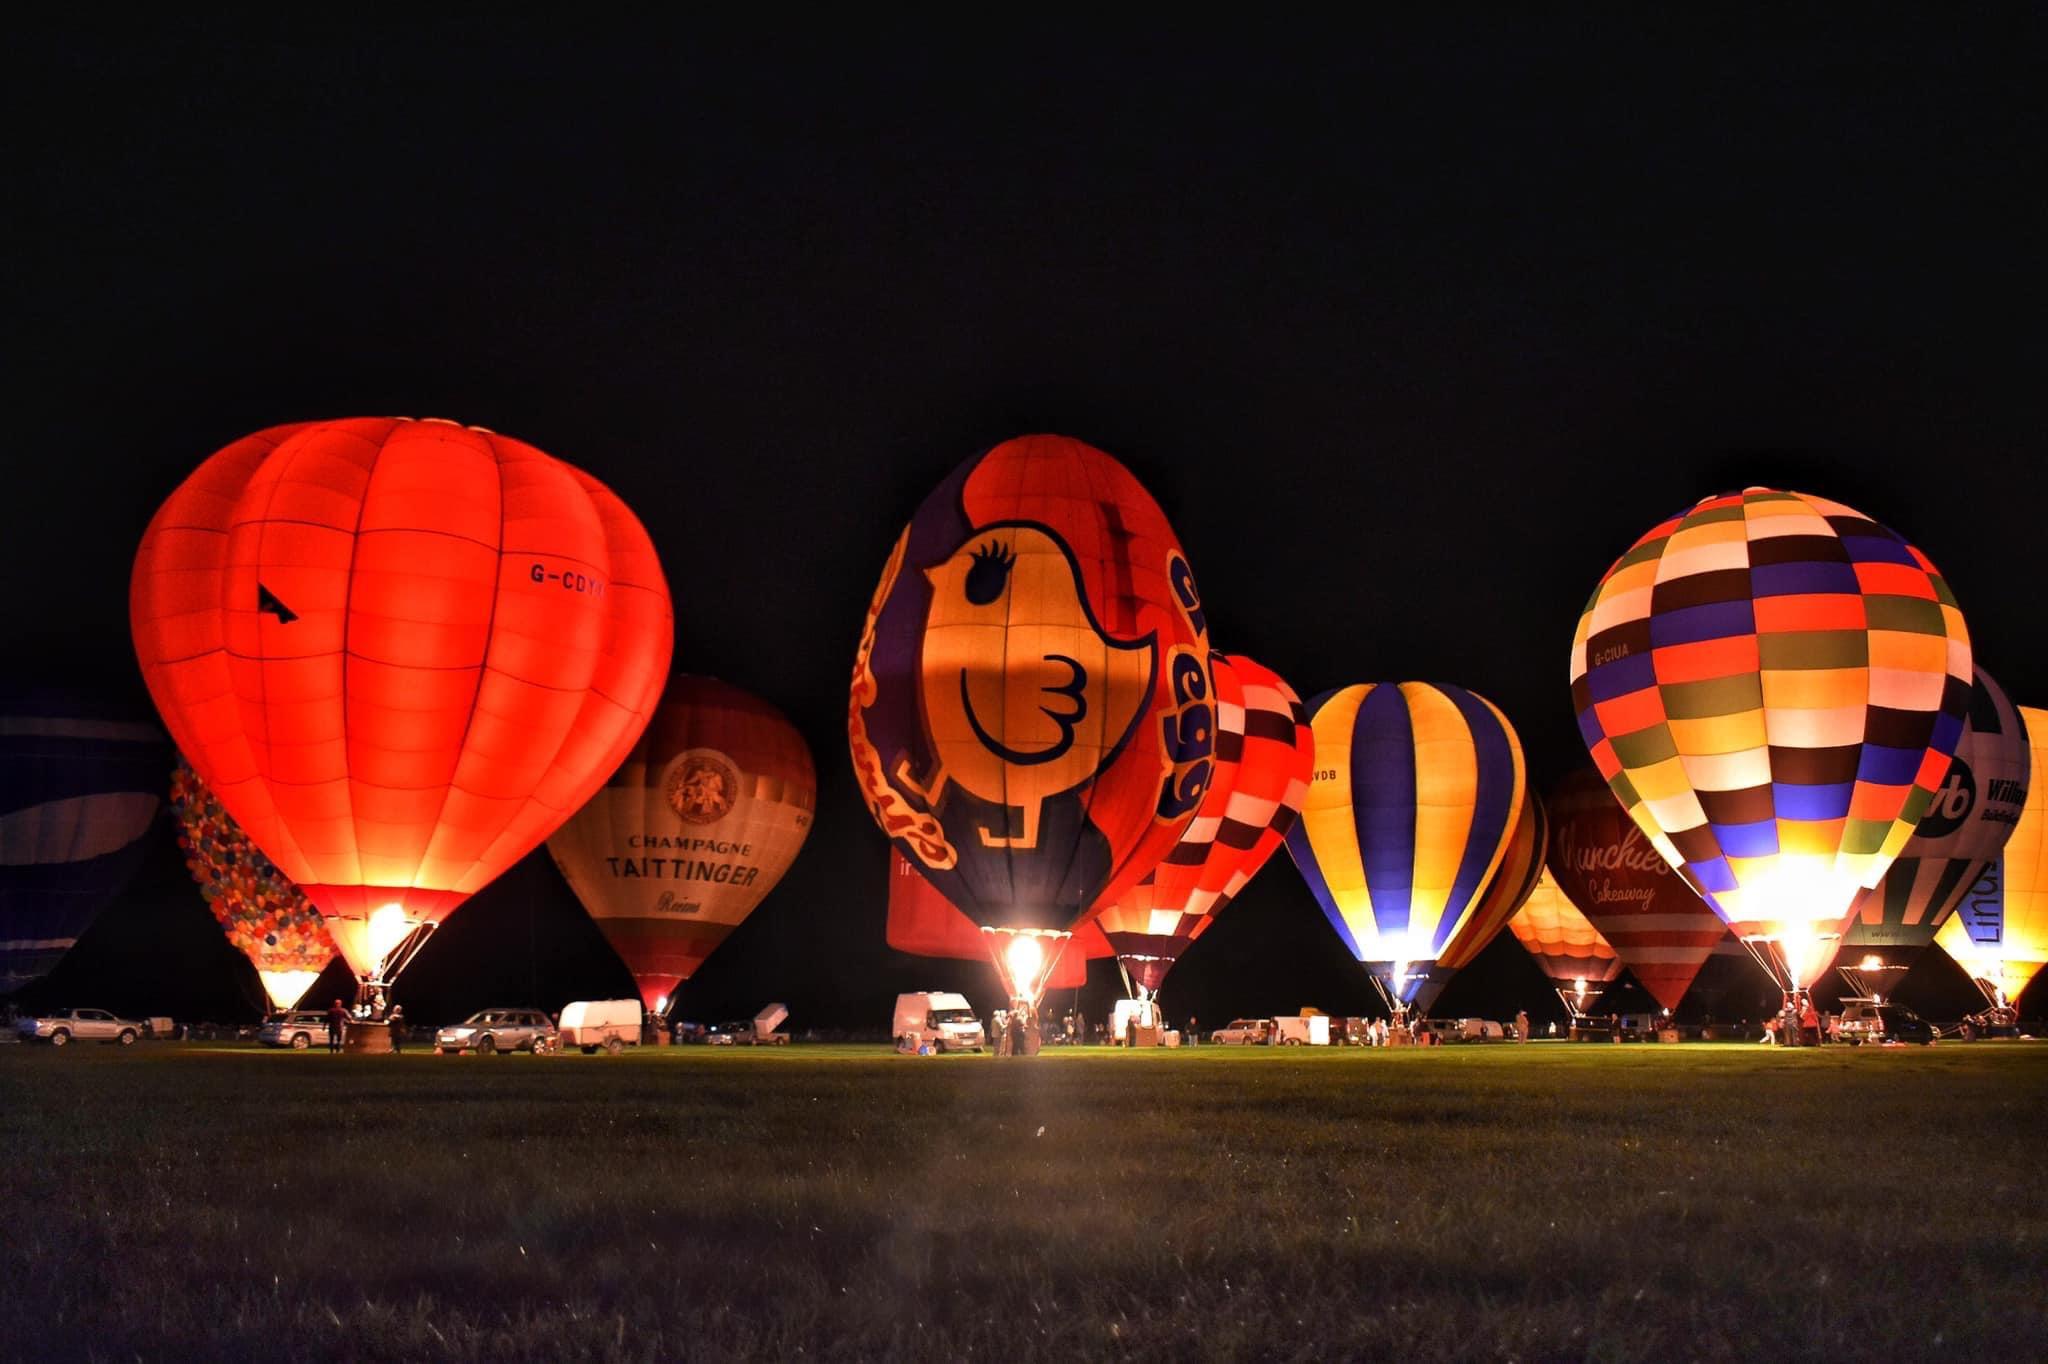 Hot air Balloons at the York Balloon fiesta - the bar will be York Gin